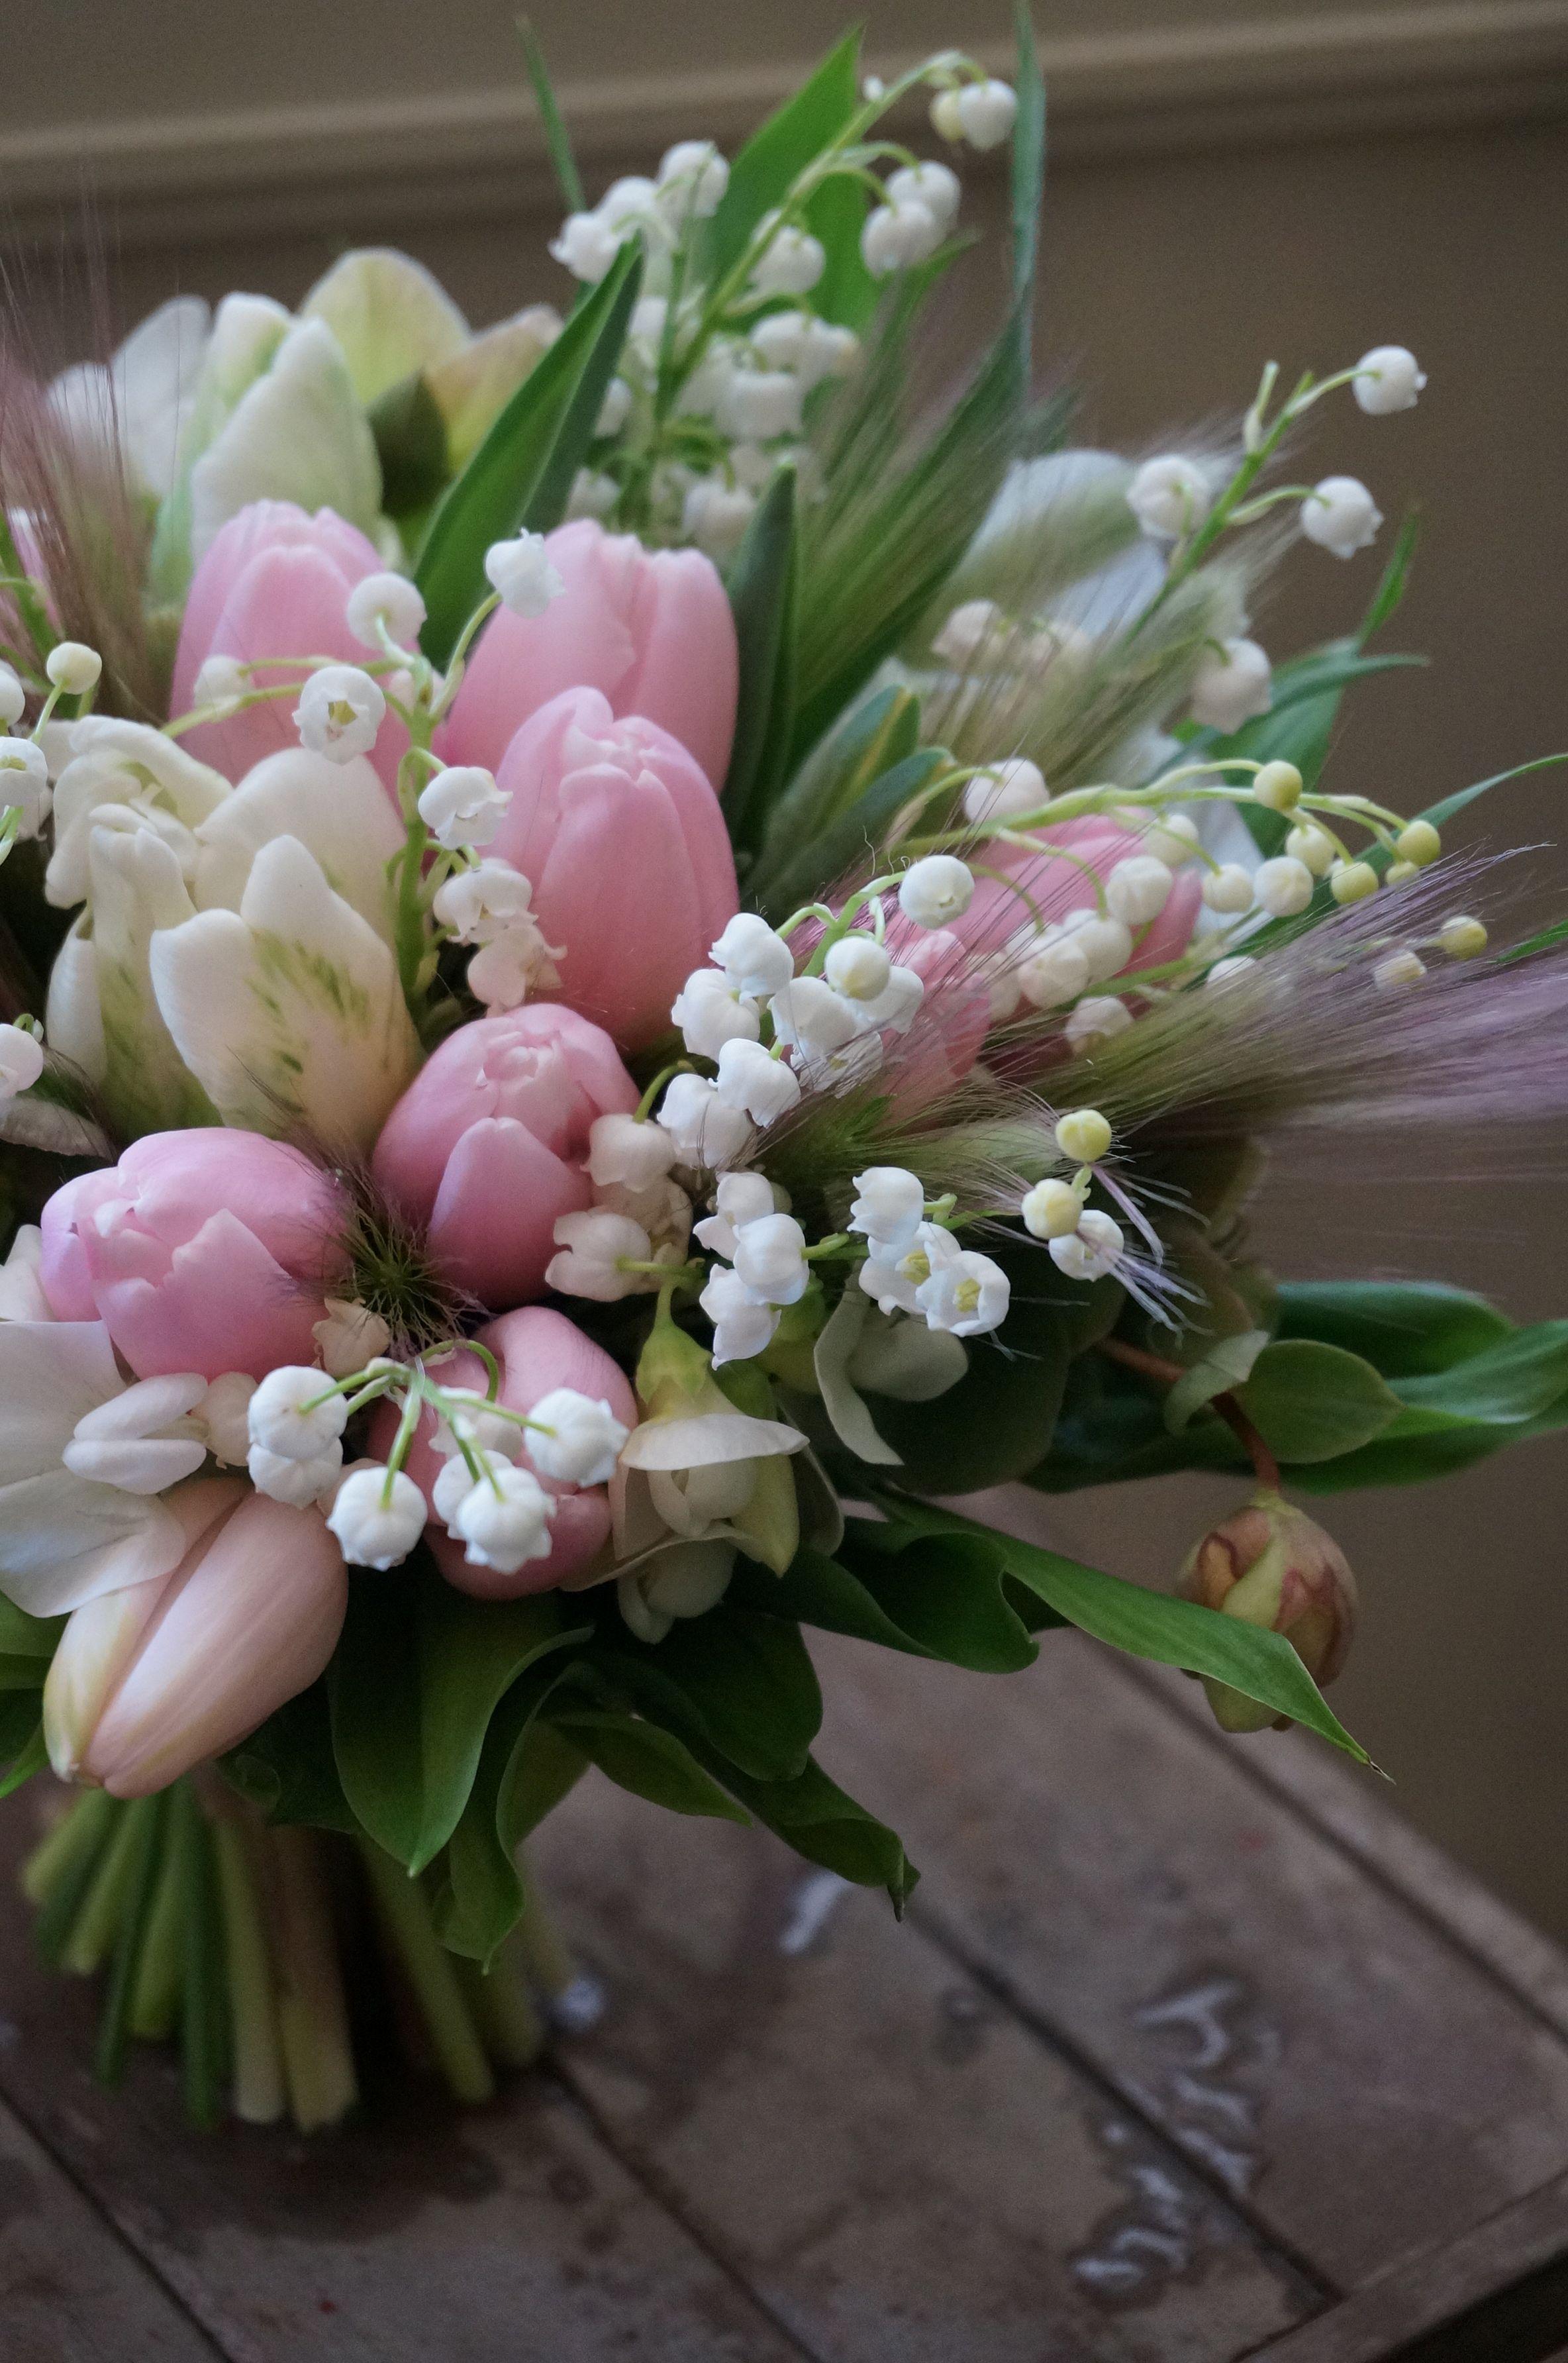 40 stunning and easy diy tulip arrangement ideas tulips